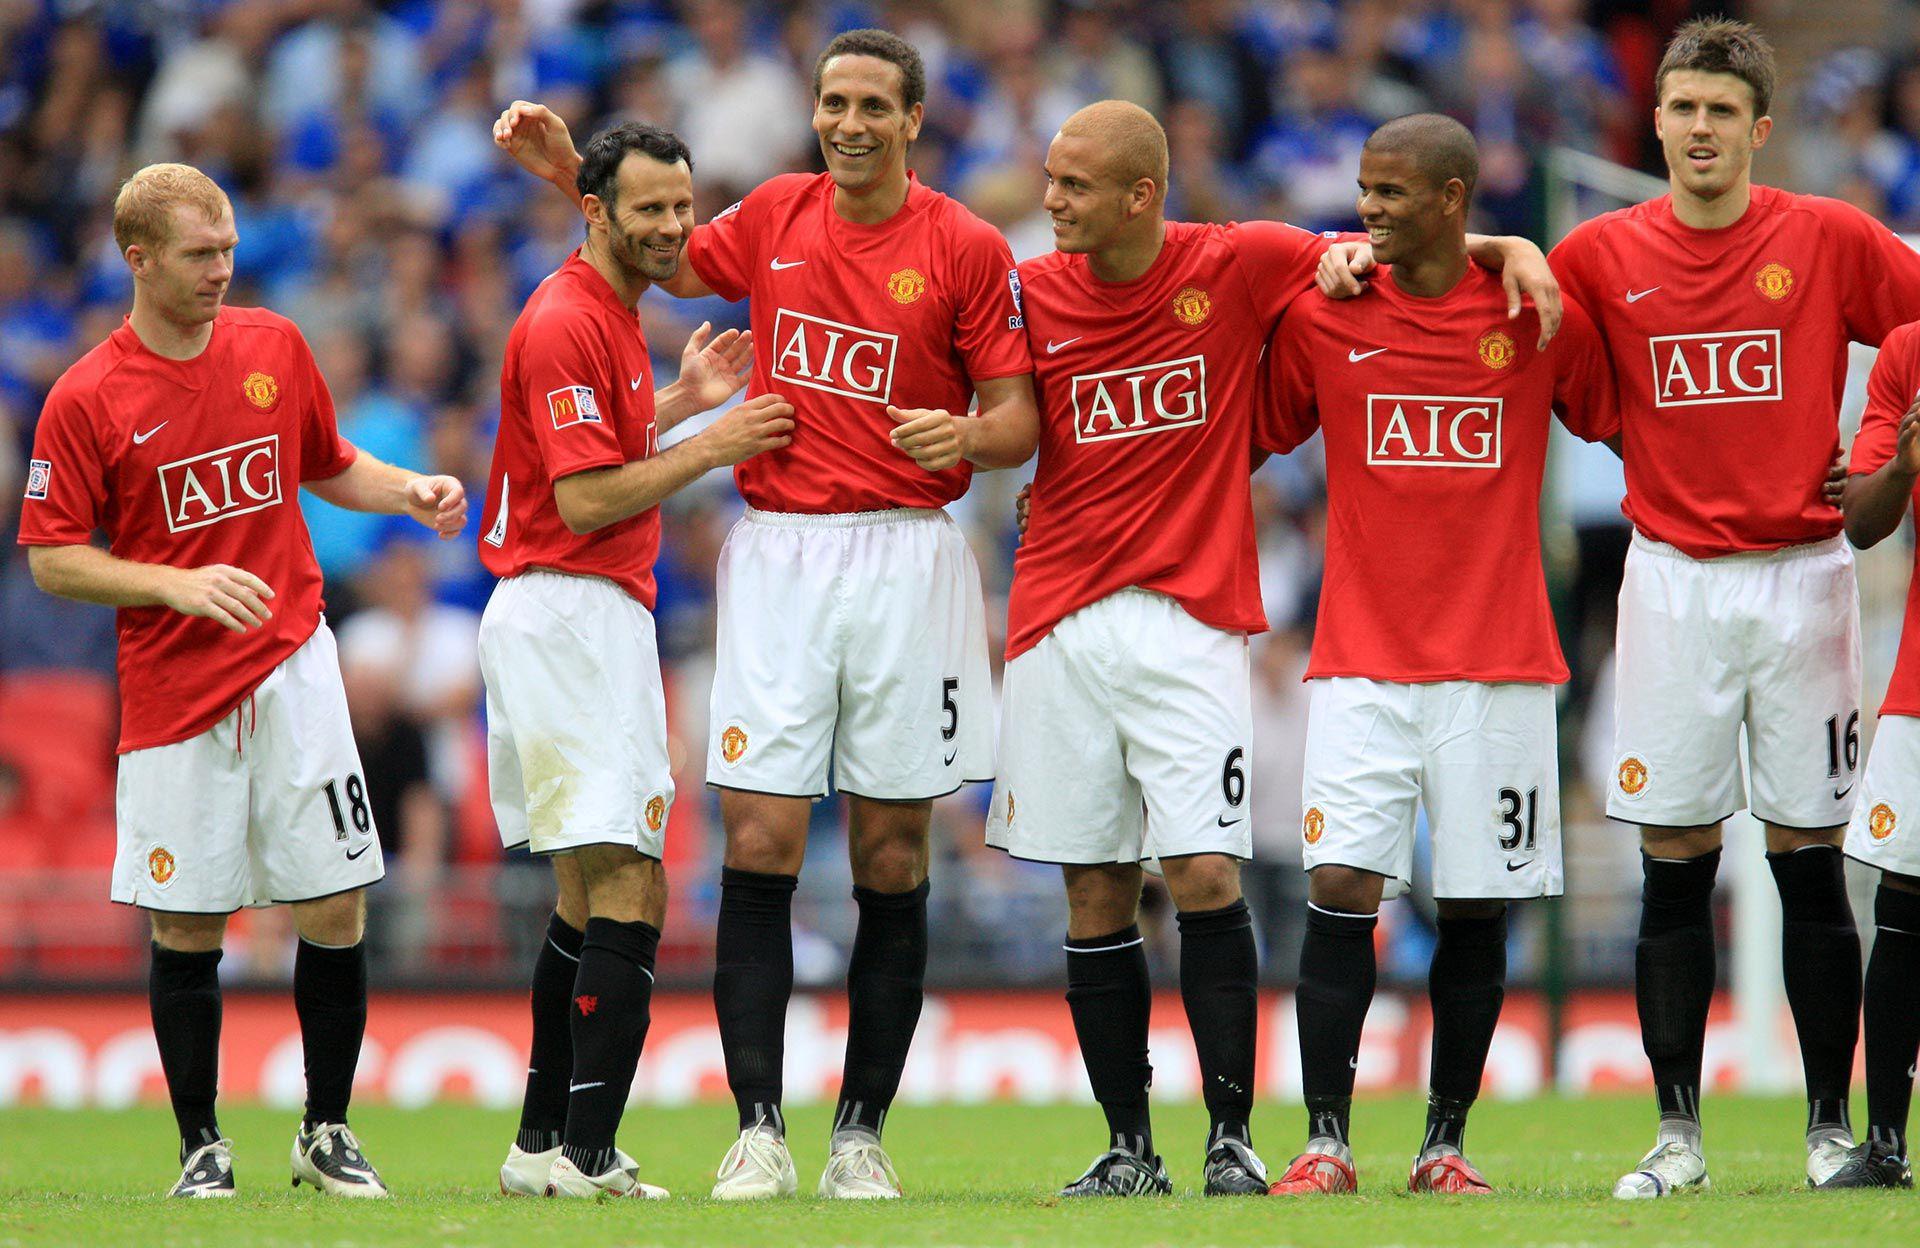 Rio Ferdinand pudo pasar del Manchester United al FC Barcelona en 2008 (Shutterstock)